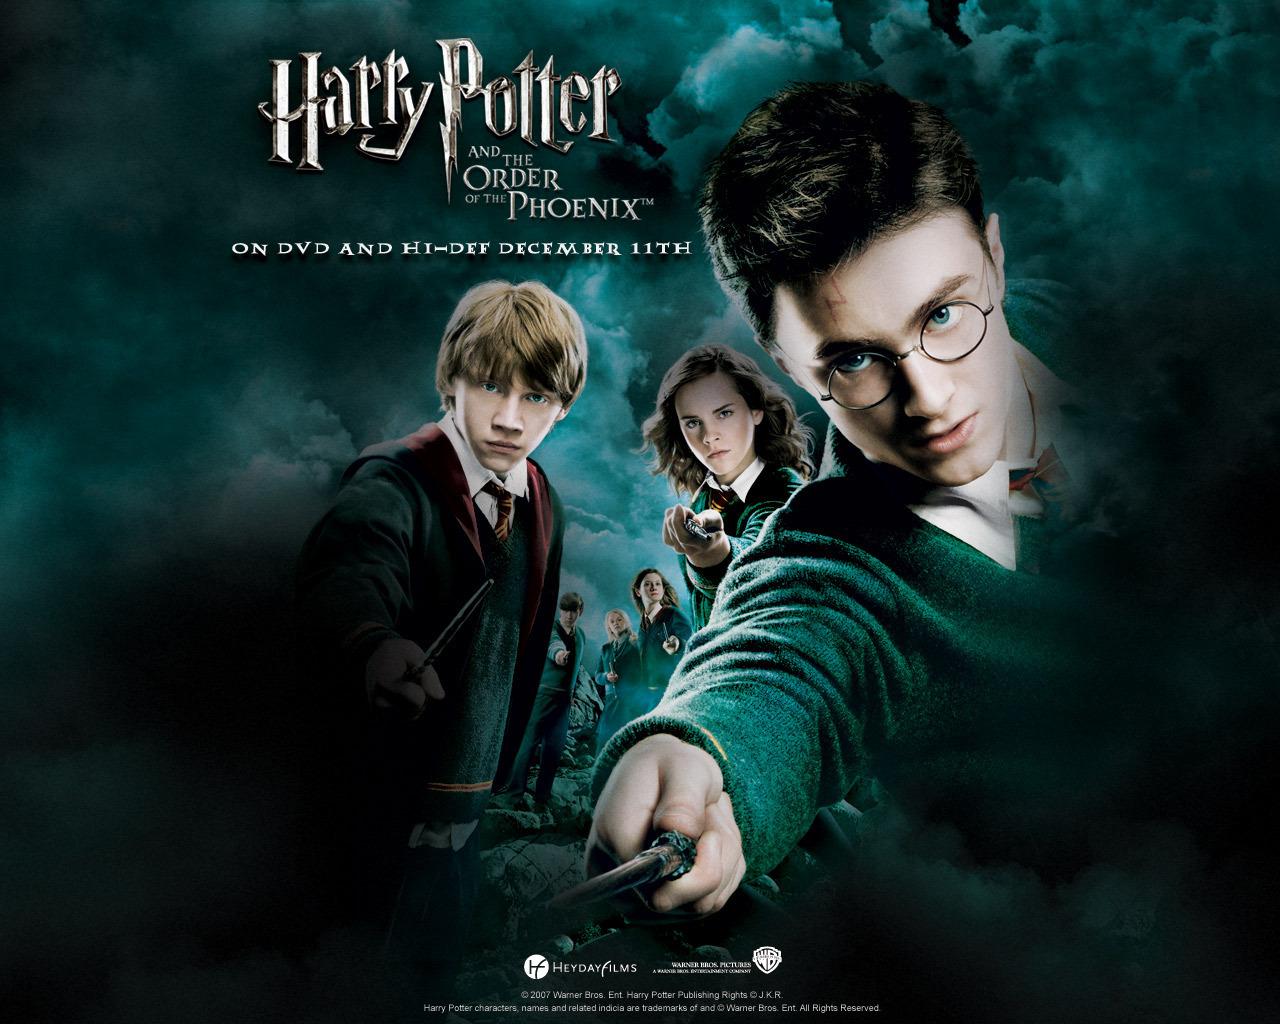 Harry Potter WINS!!!